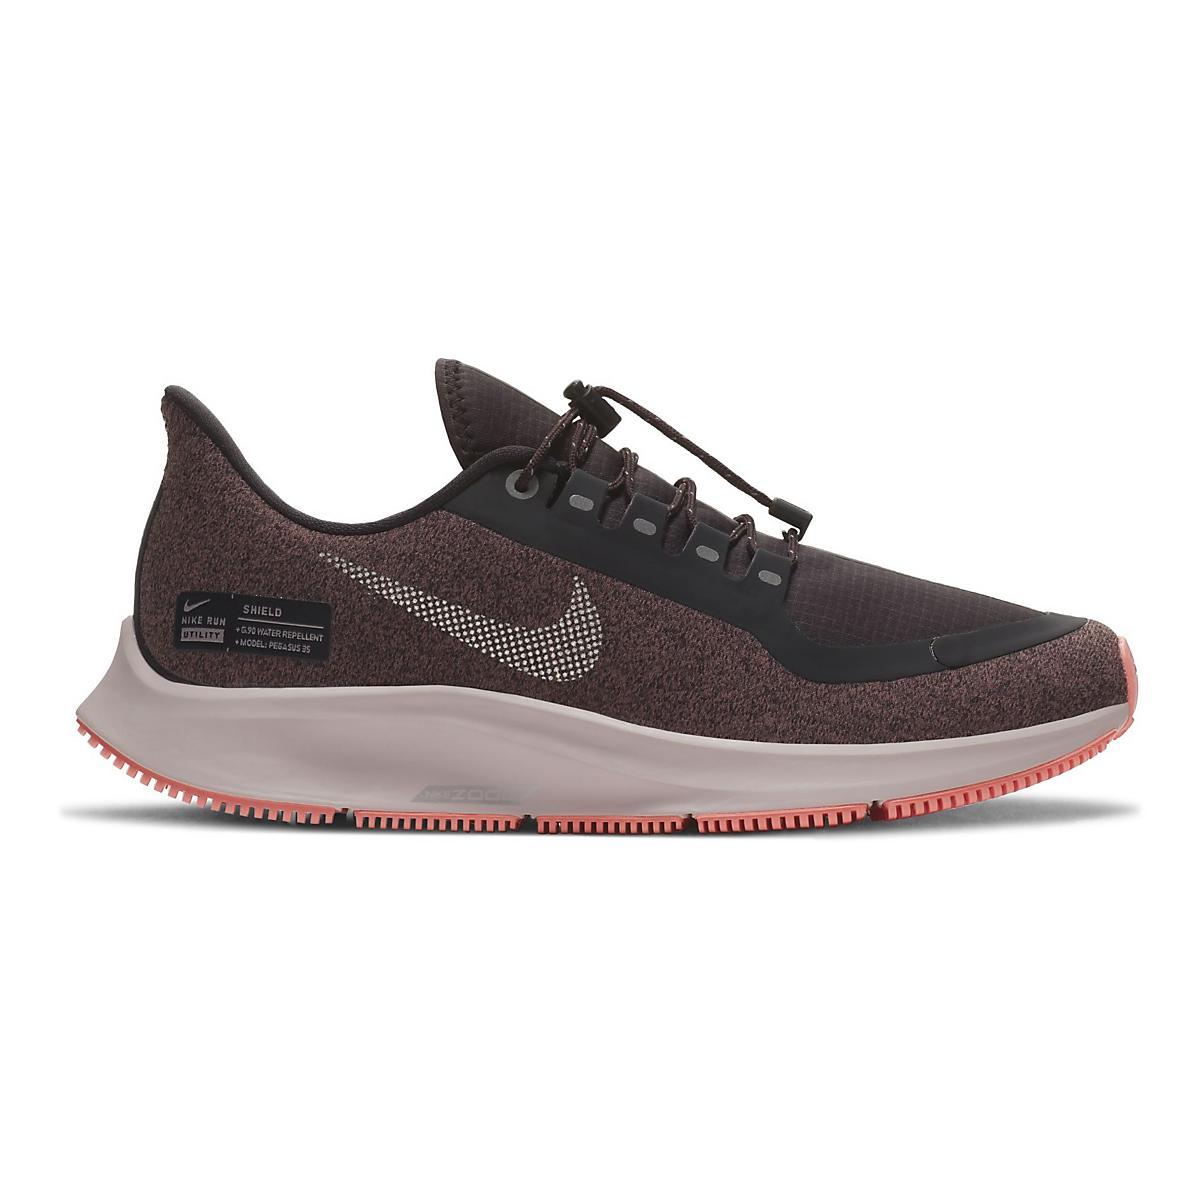 8fbf5715c0fa1 Womens Nike Air Zoom Pegasus 35 Shield Running Shoe at Road Runner Sports